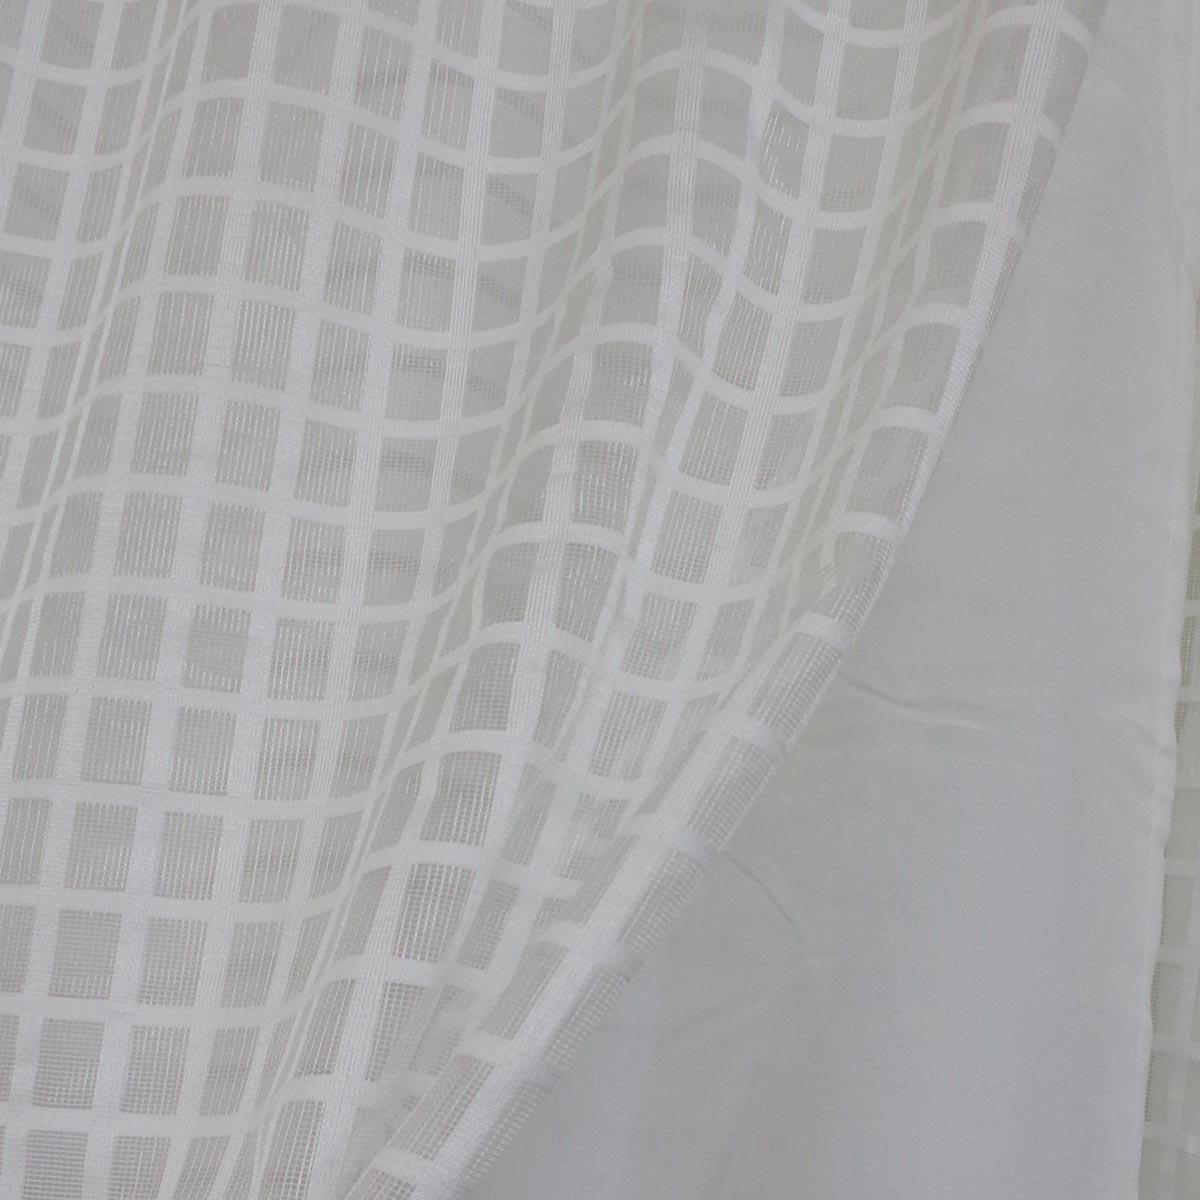 Cortina Duplex 4.20m x 2.50m Vintage / Xadrez Marfim Bella Janela